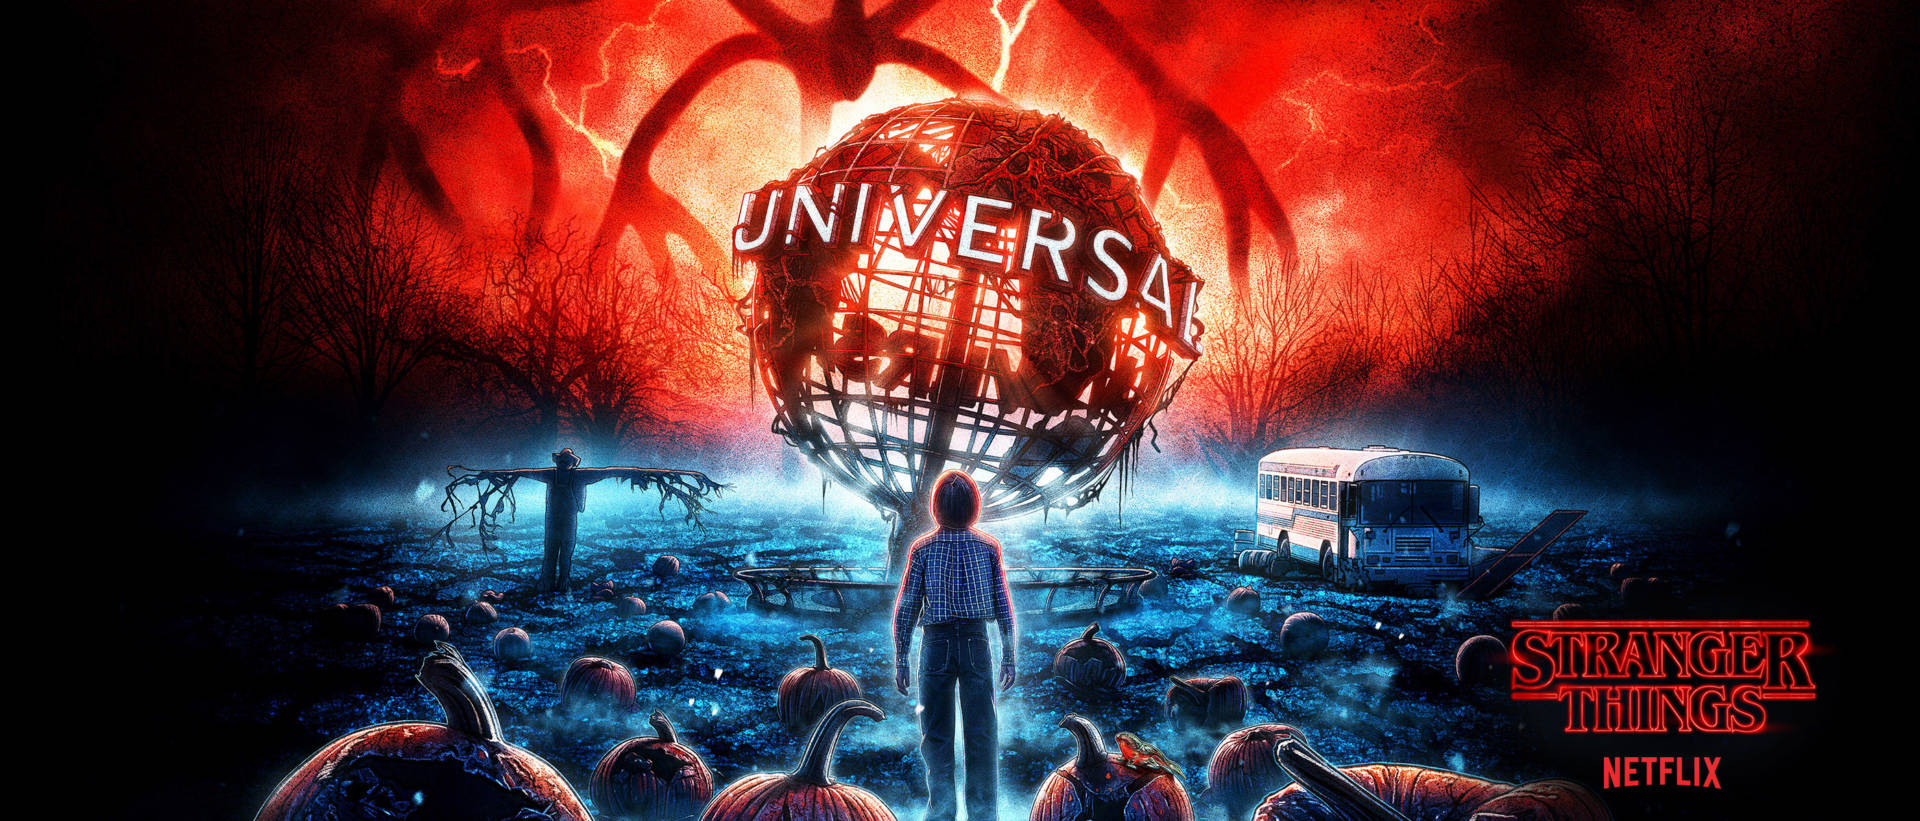 Halloween Horror Nights 2019 Poster.Universal Studios Hollywood Halloween Horror Nights